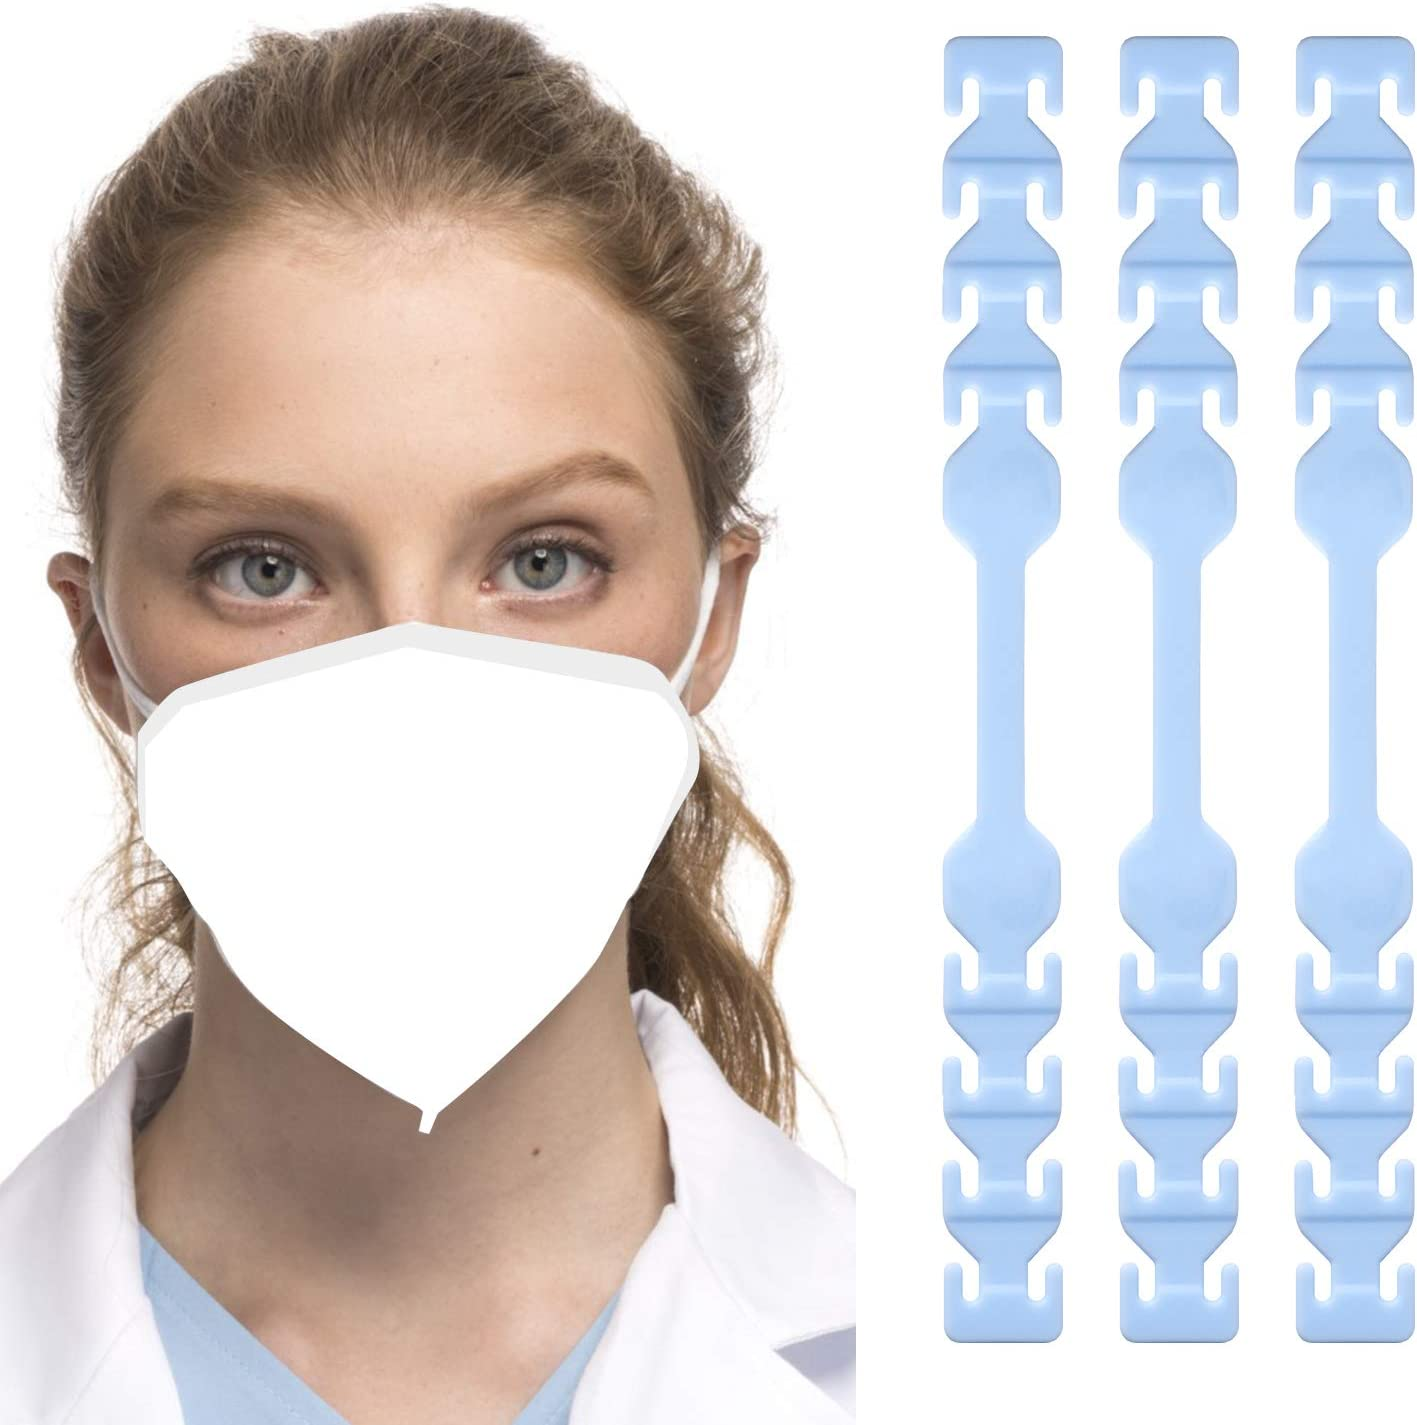 labato Mask Extension 半額 Hook Hooks スーパーセール Anti-Slip Extender Comfort